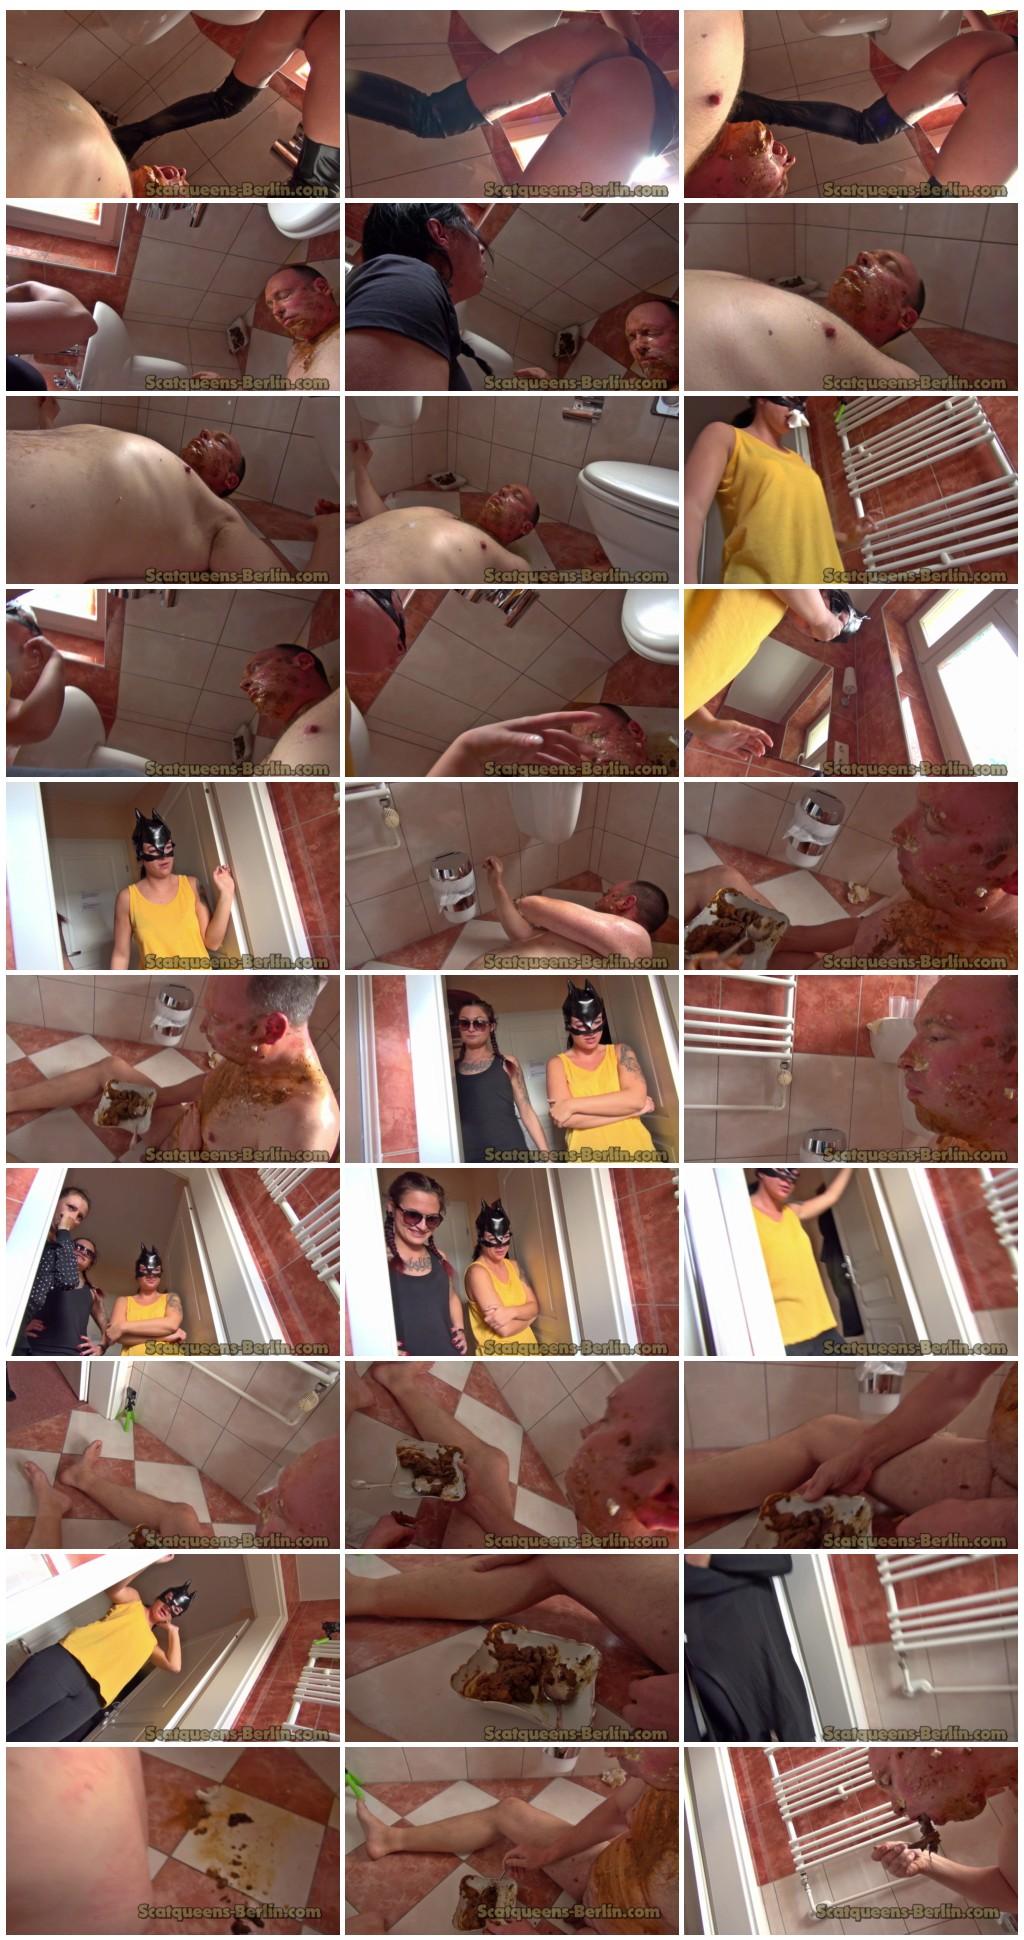 4 Scatqueens 1 Slave P3 Scat pissing shit defecation Femdom Toilet SlaveryFace shitFingeringDomination Eat shit HumiliationsLicking Drink peespitting Vomiting thumb - 4 Scatqueens 1 Slave P3 [Scat, pissing, shit,  Femdom ,Toilet Slavery,Fingering,Domination, Eat shit , Humiliations,Licking, Drink pee,spitting, Vomiting]